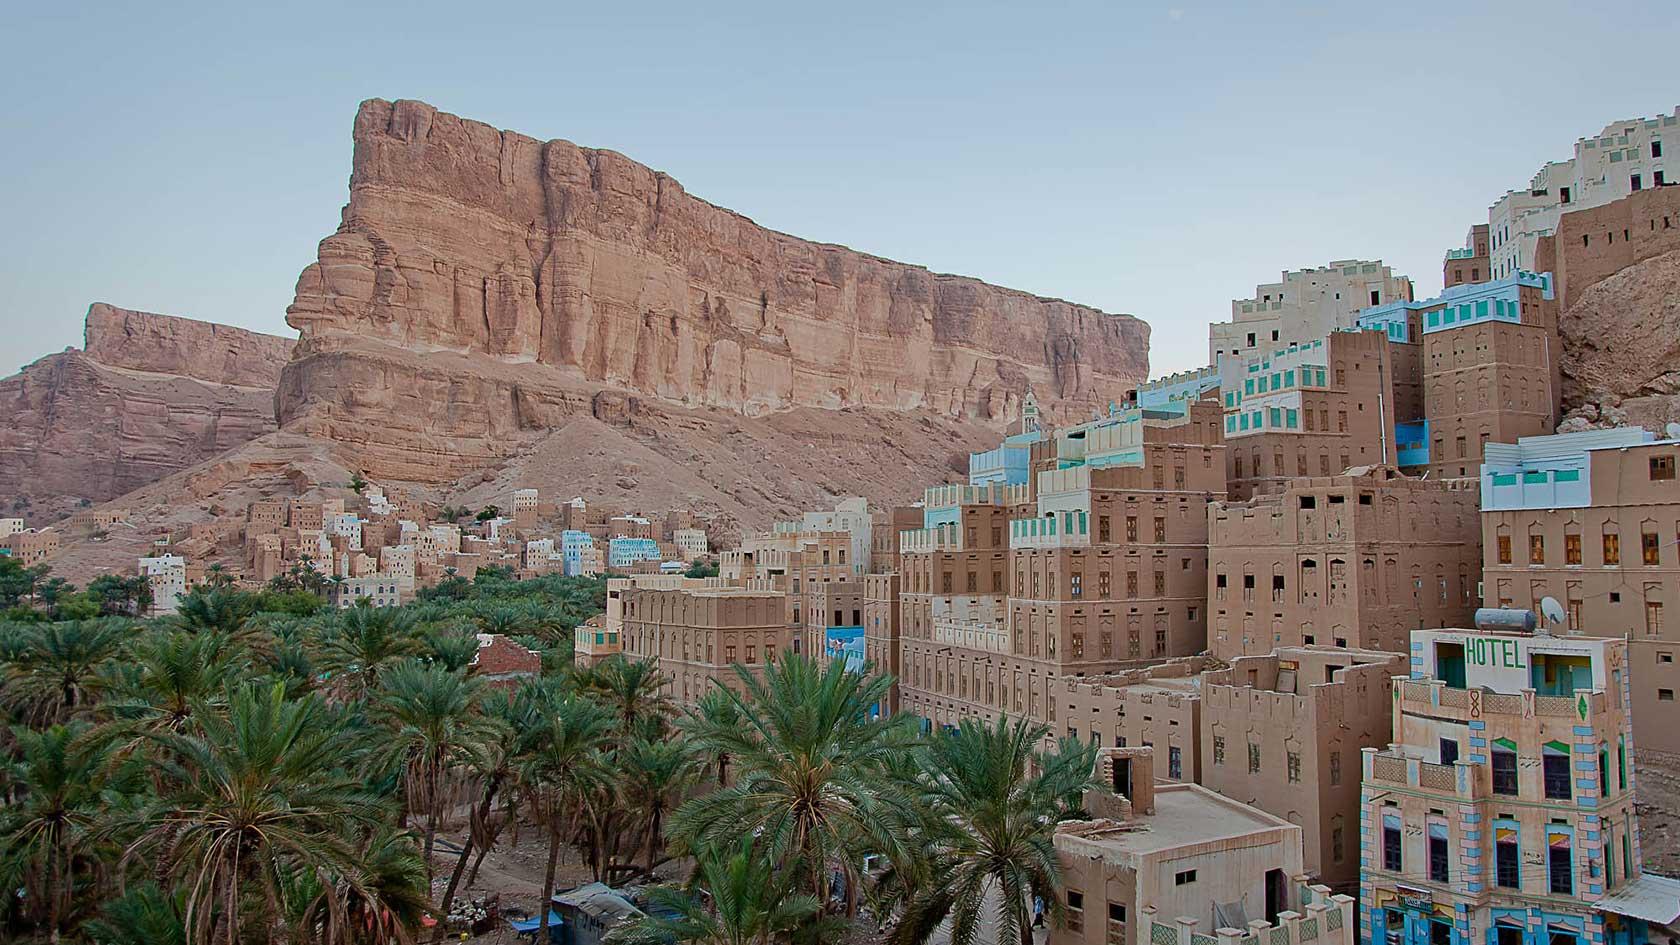 anthony-pappone-yemen-featured